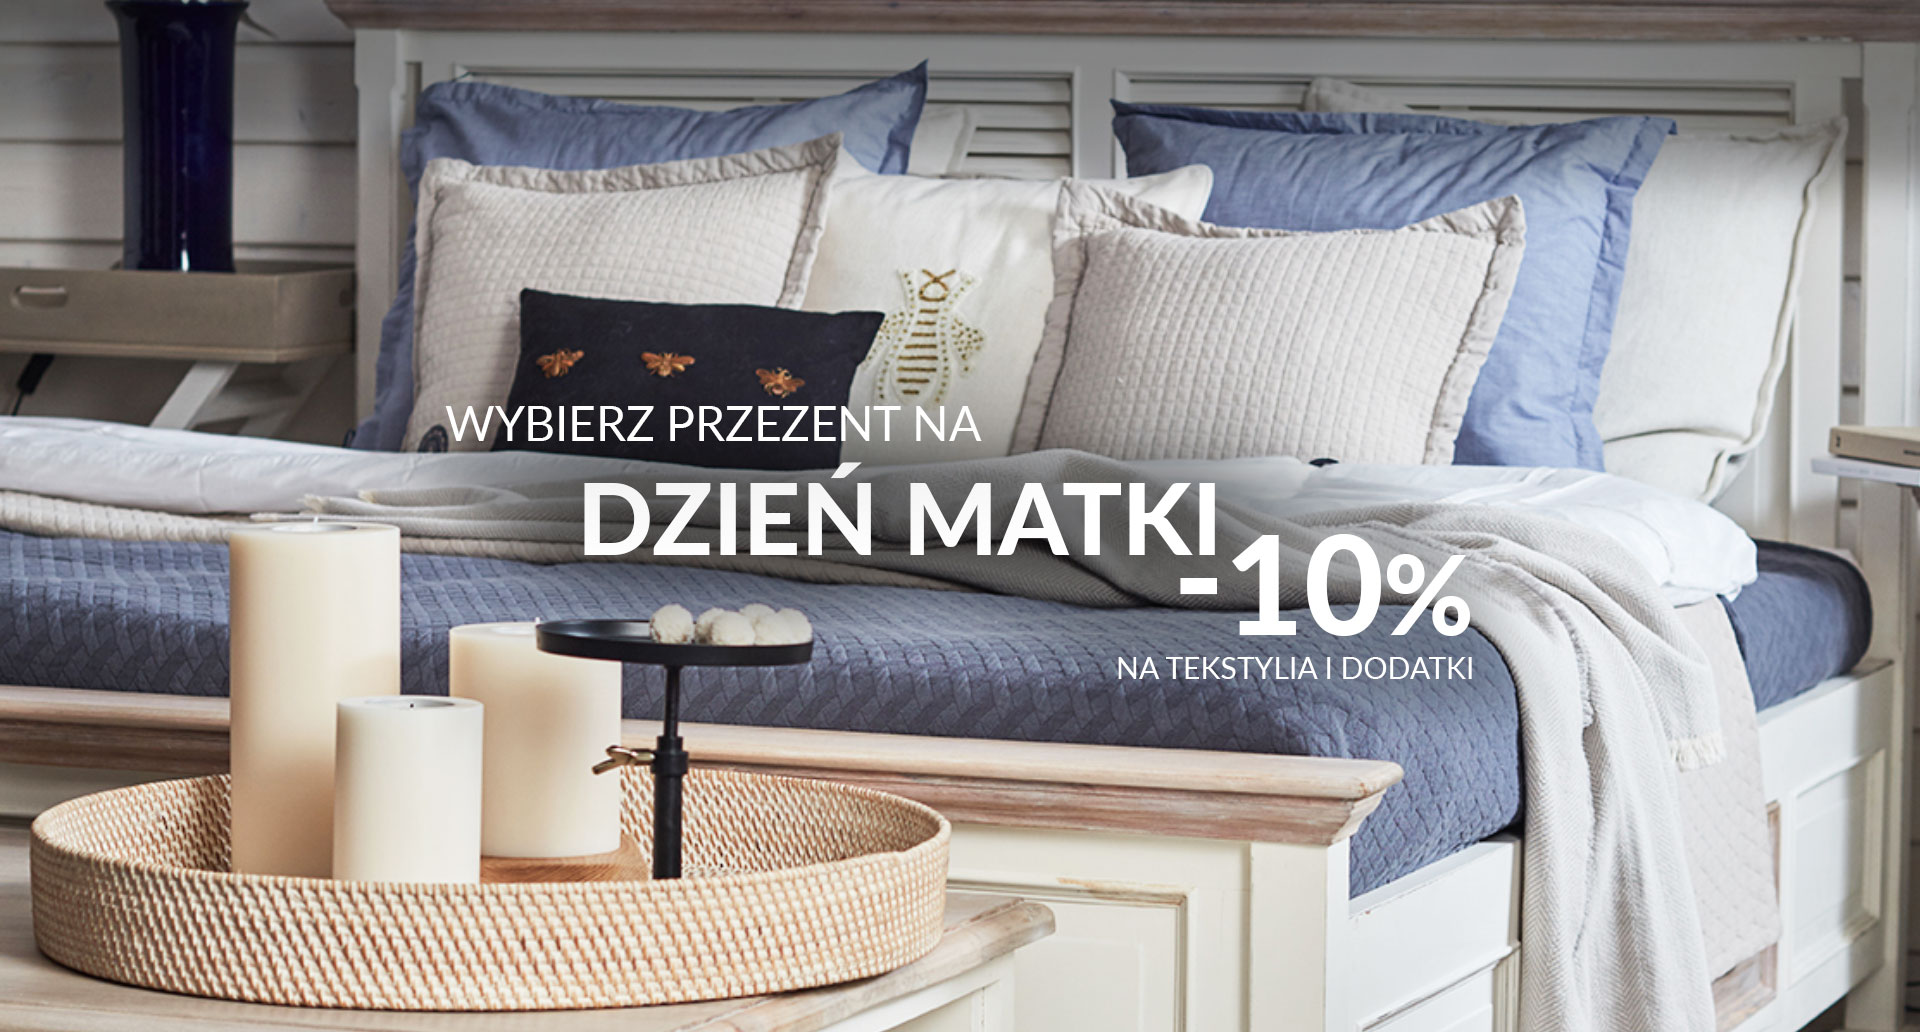 Miloo Home: 10% rabatu na tekstylia i dodatki z okazji Dnia Matki